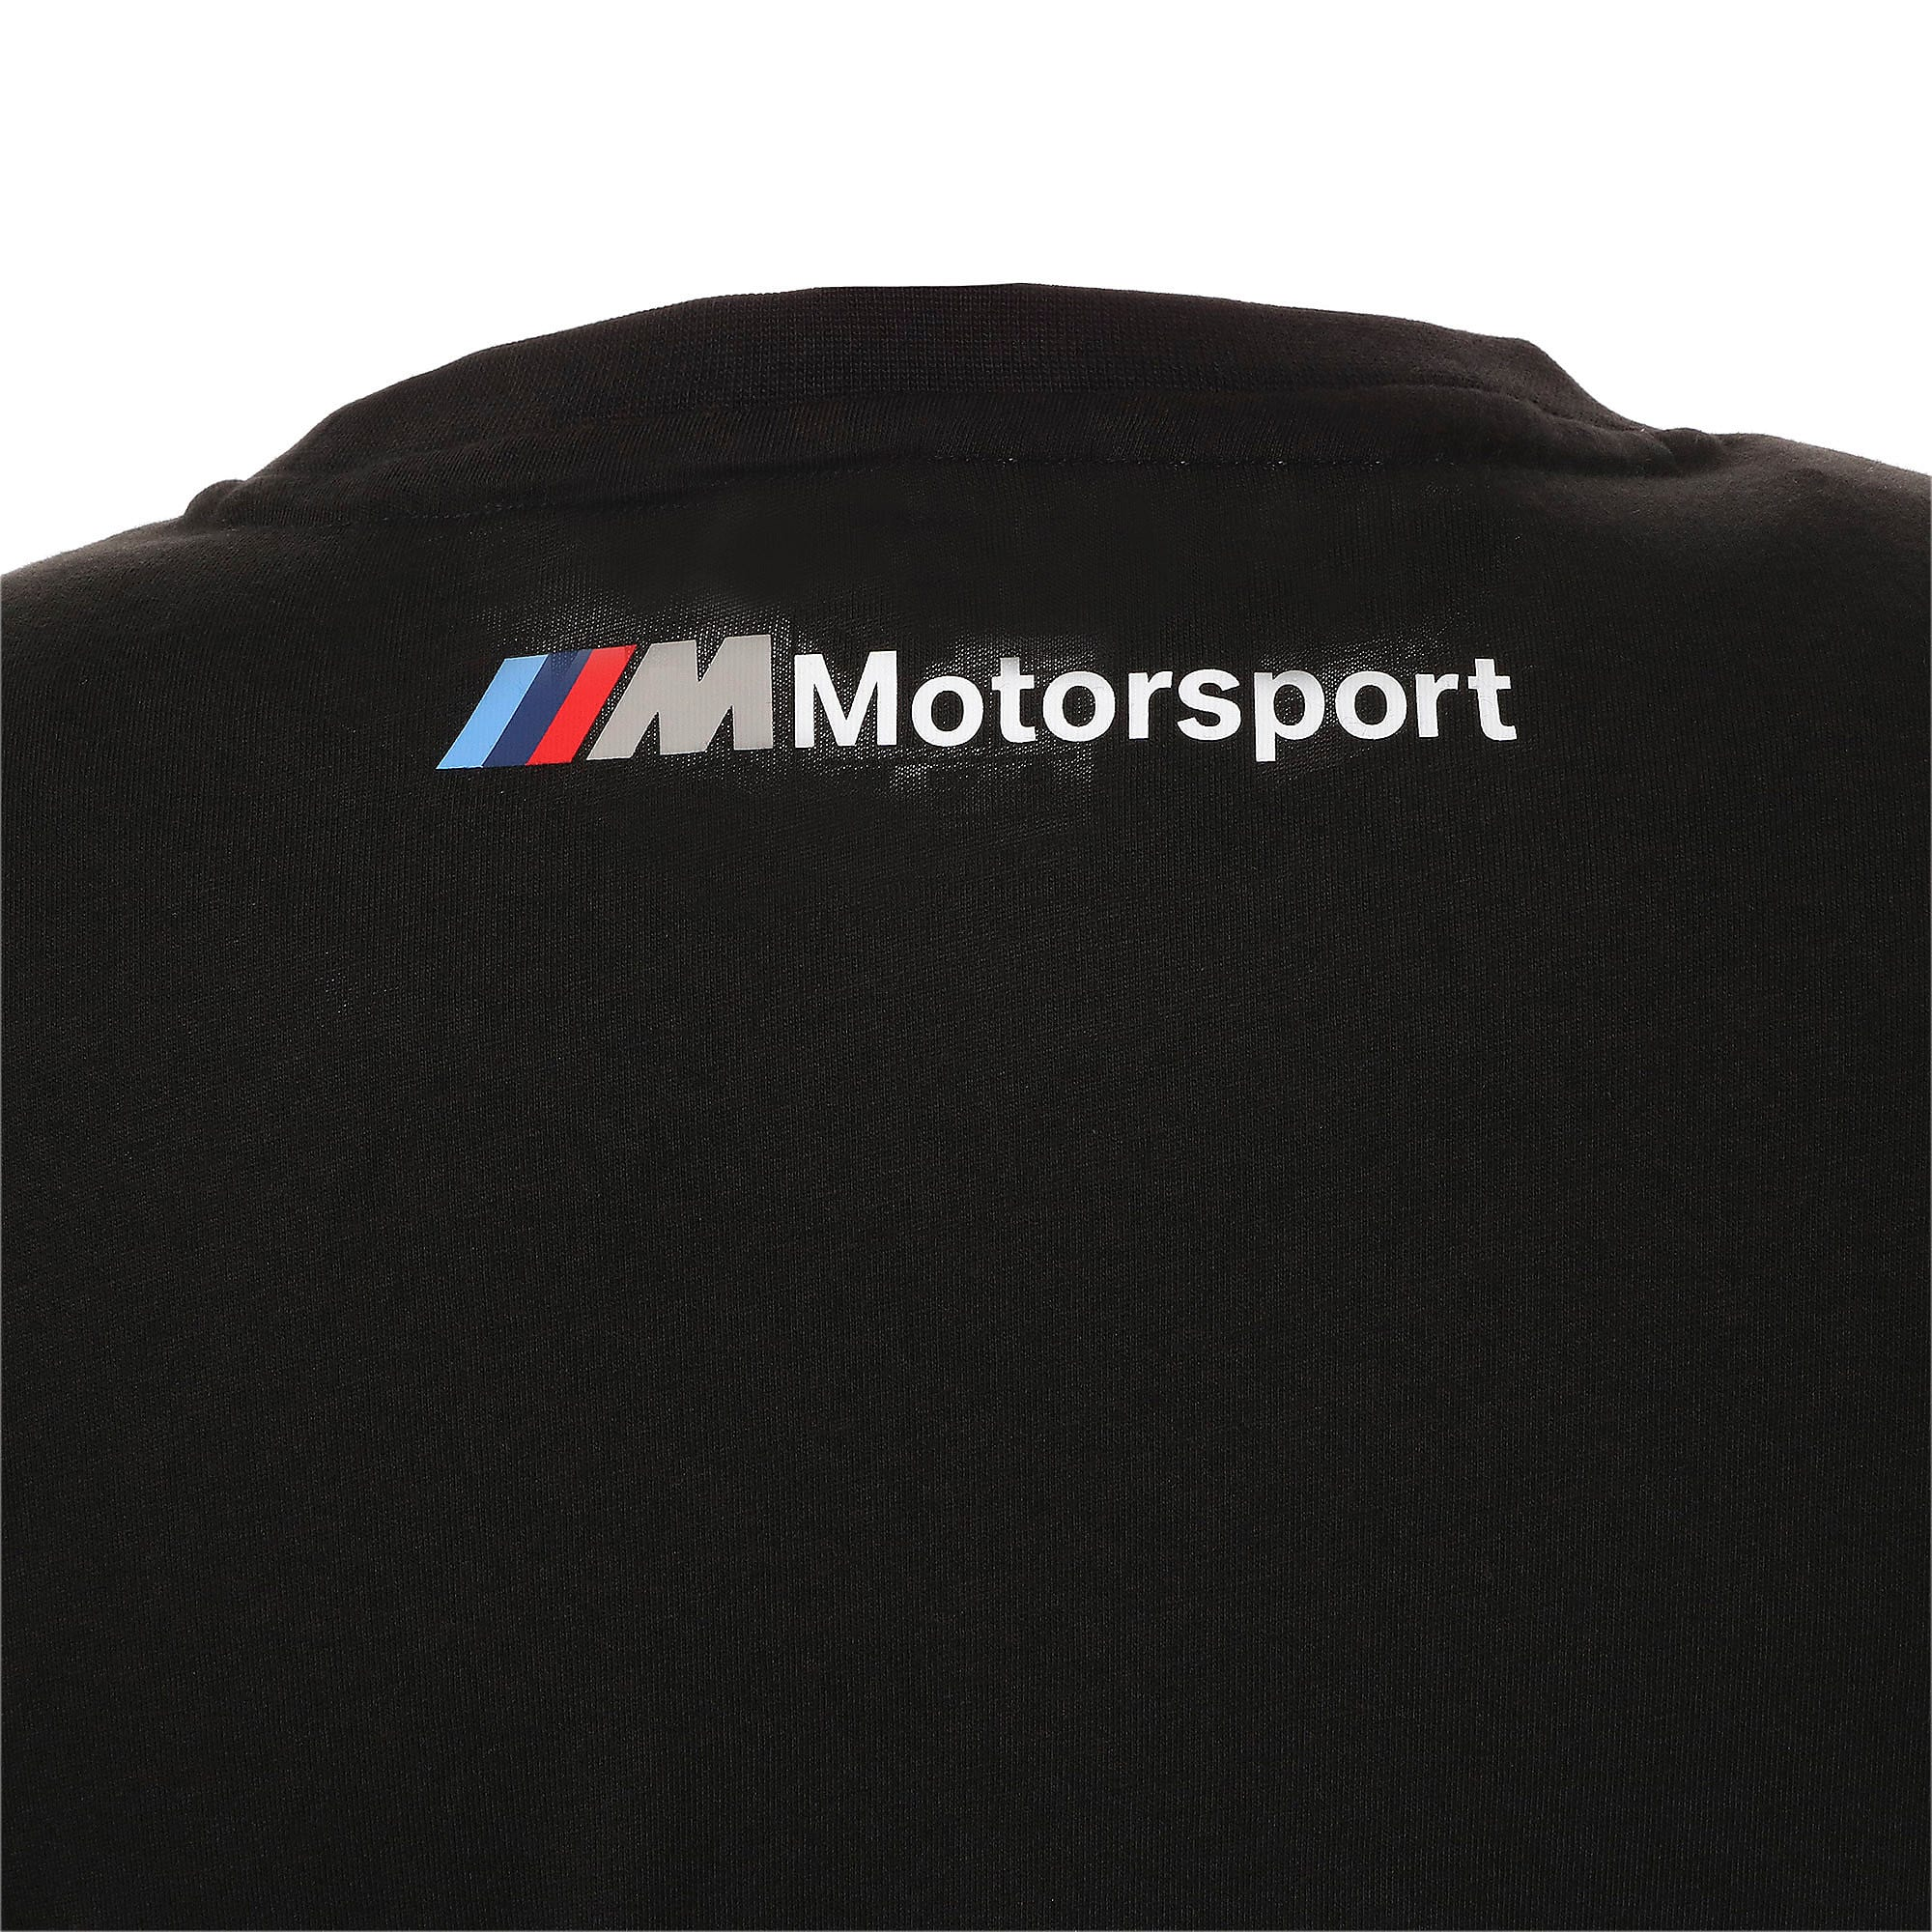 Thumbnail 12 of BMW MMS ロゴ Tシャツ +, Puma Black, medium-JPN